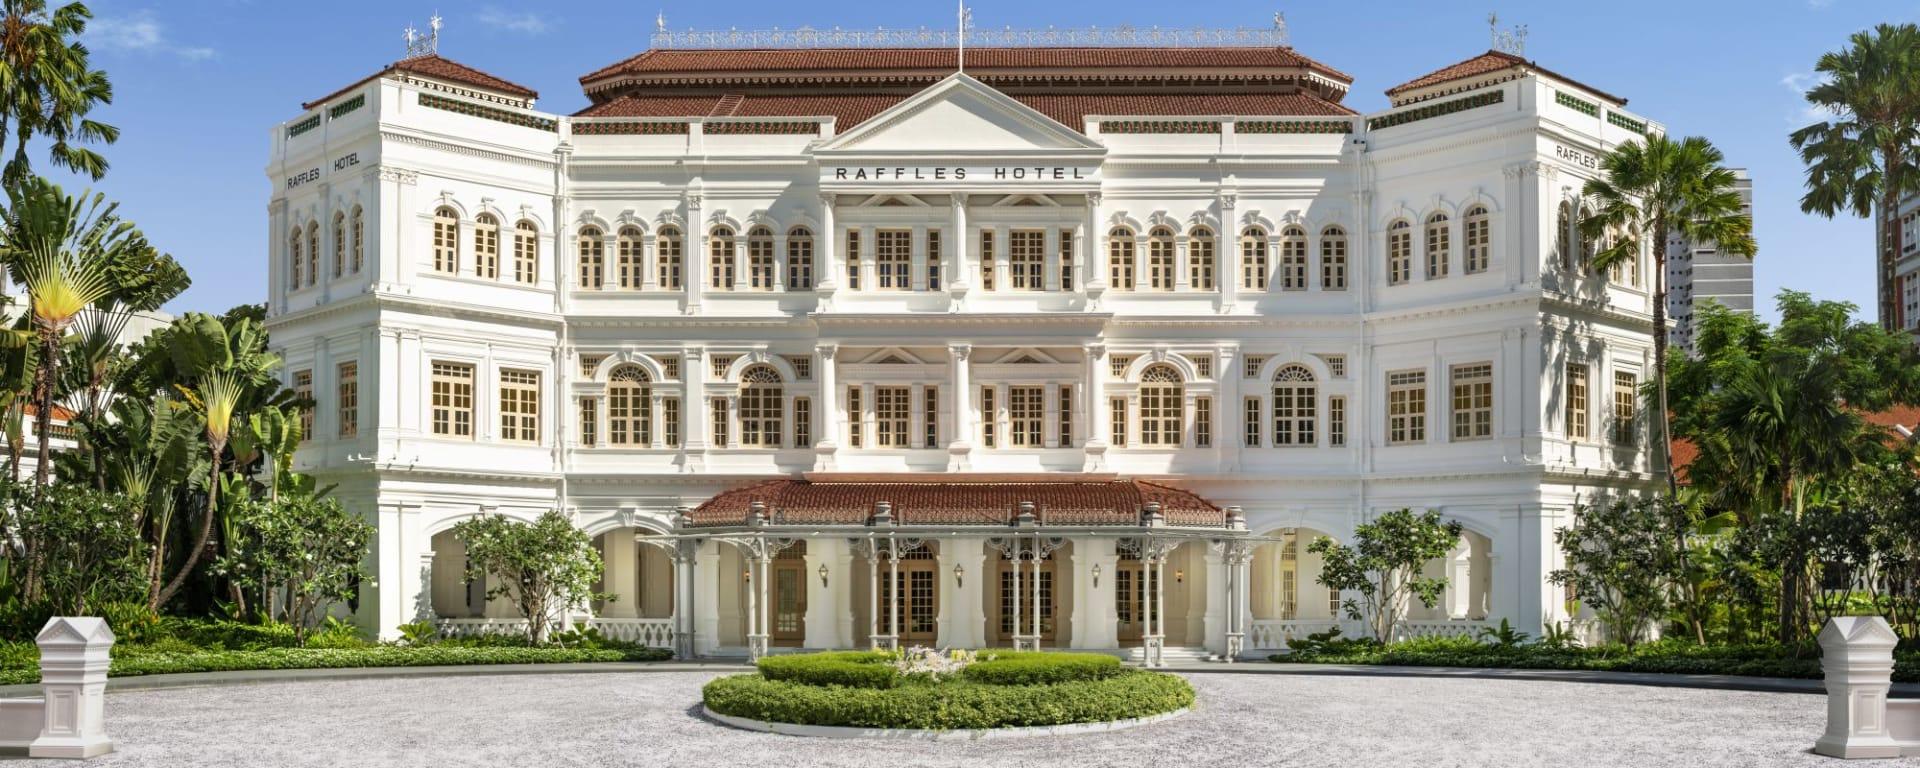 Raffles Singapore in Singapur: Full Hotel Facade Day